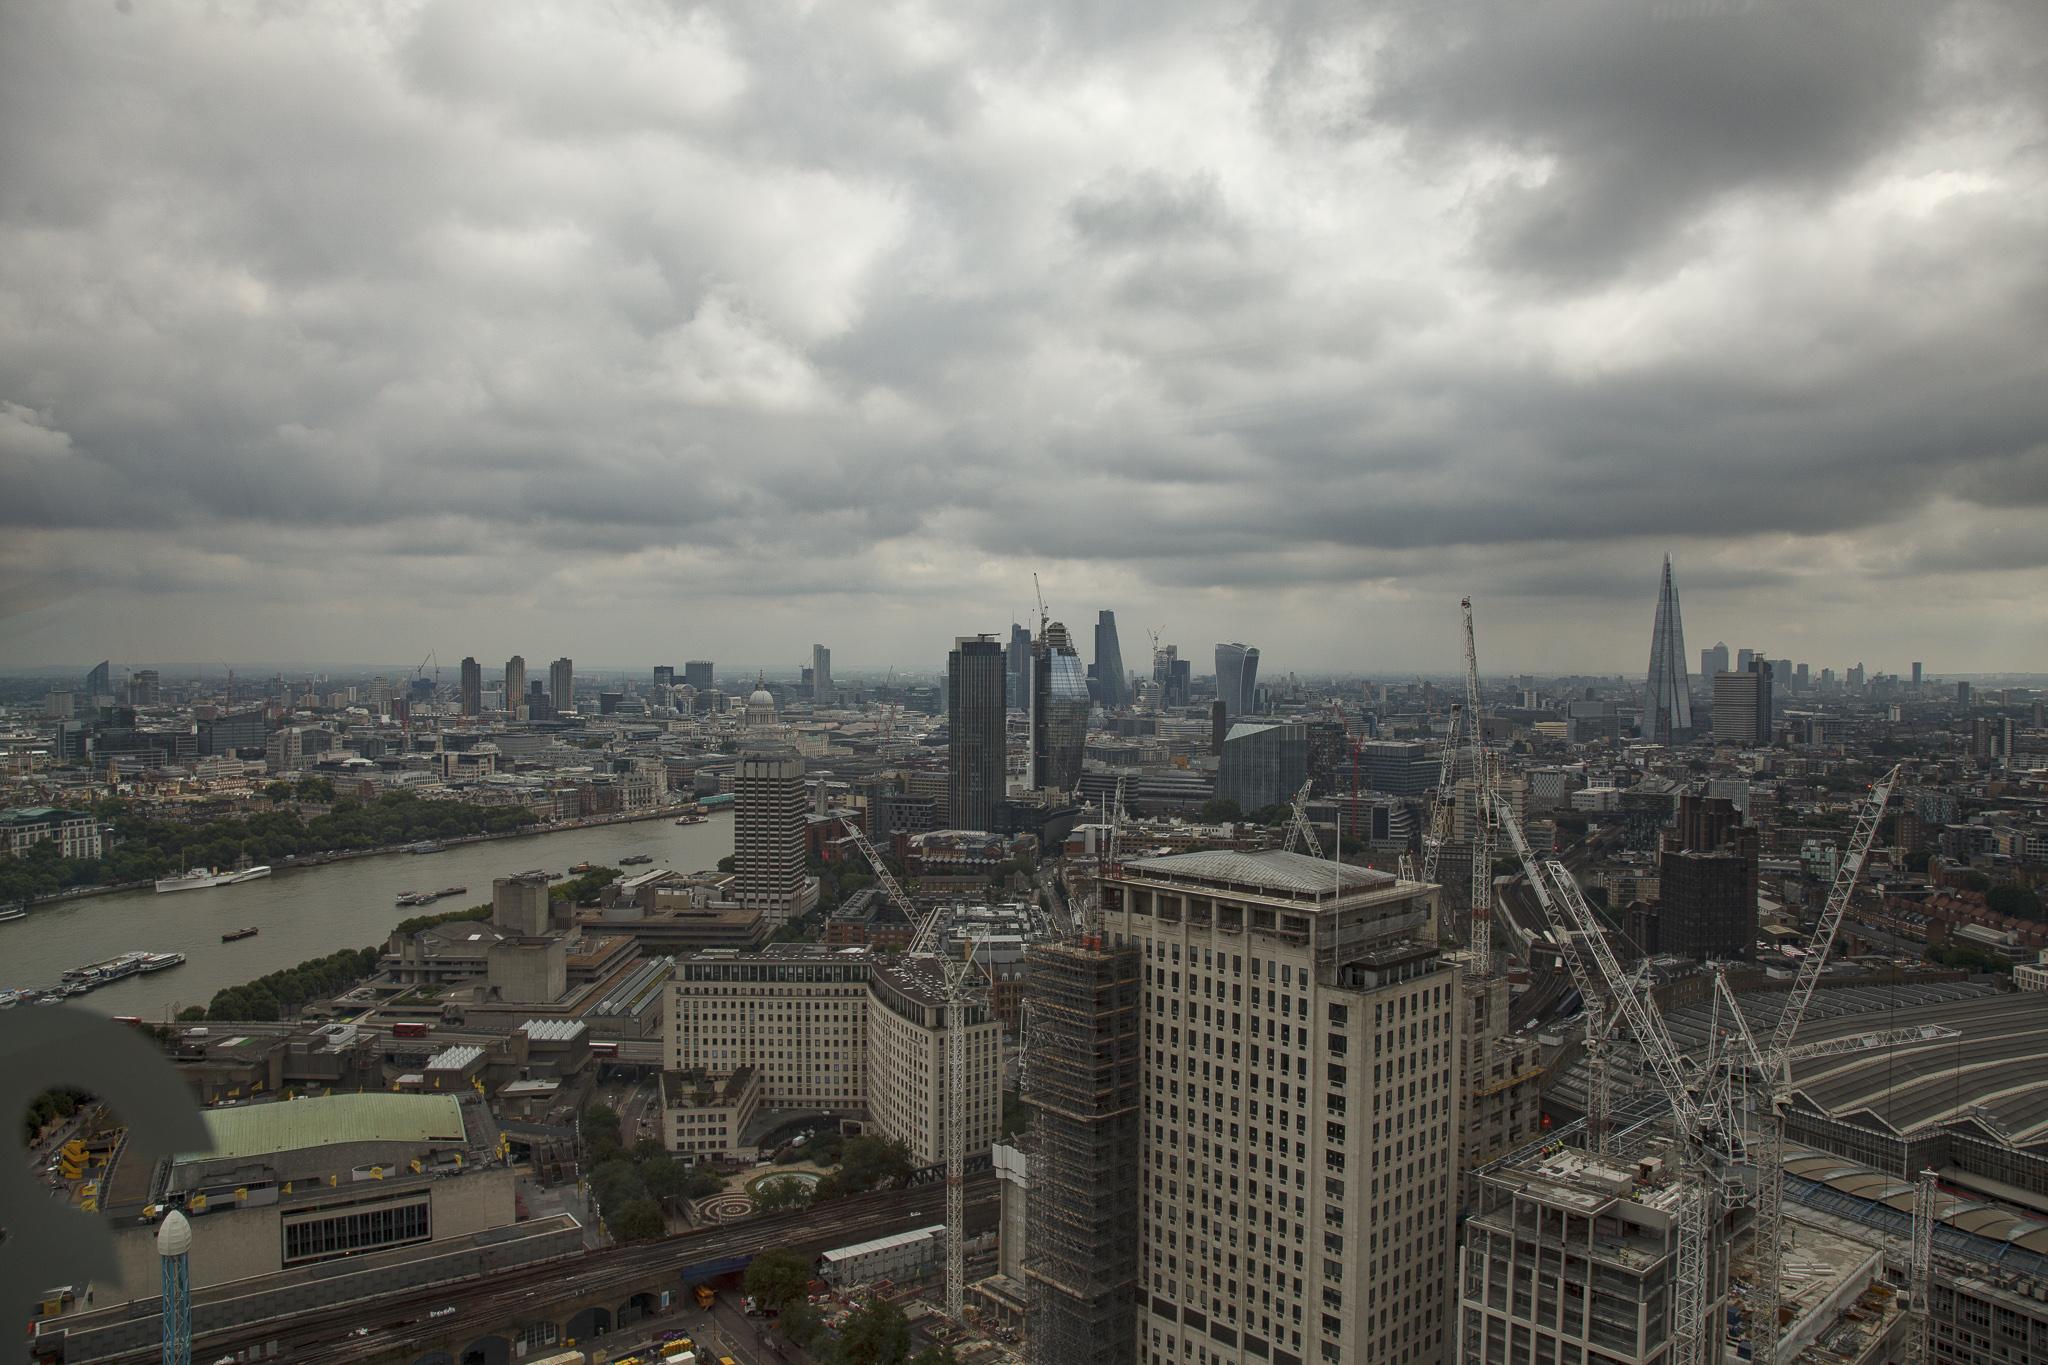 London City center from London eye